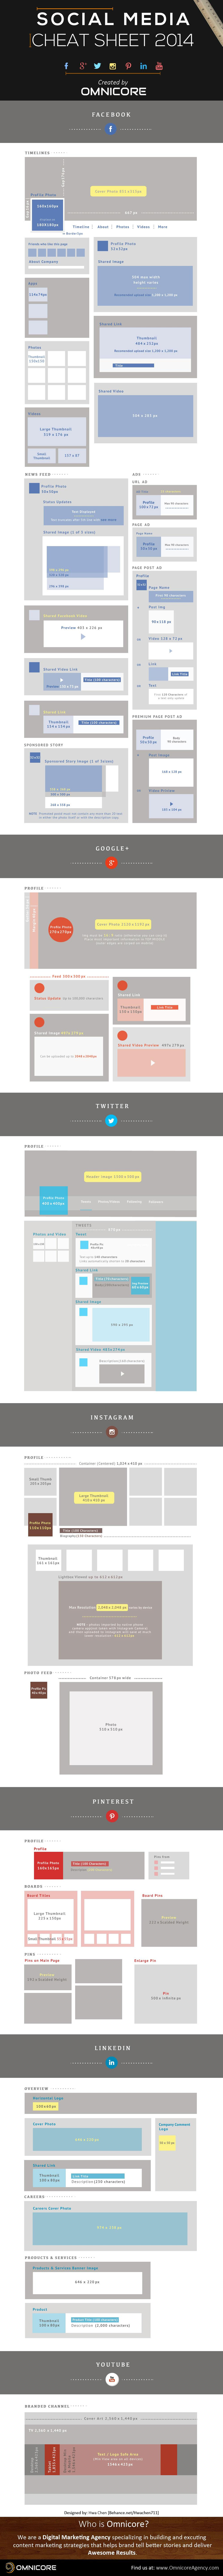 Social Media Cheat Sheet 2014 thetecnica